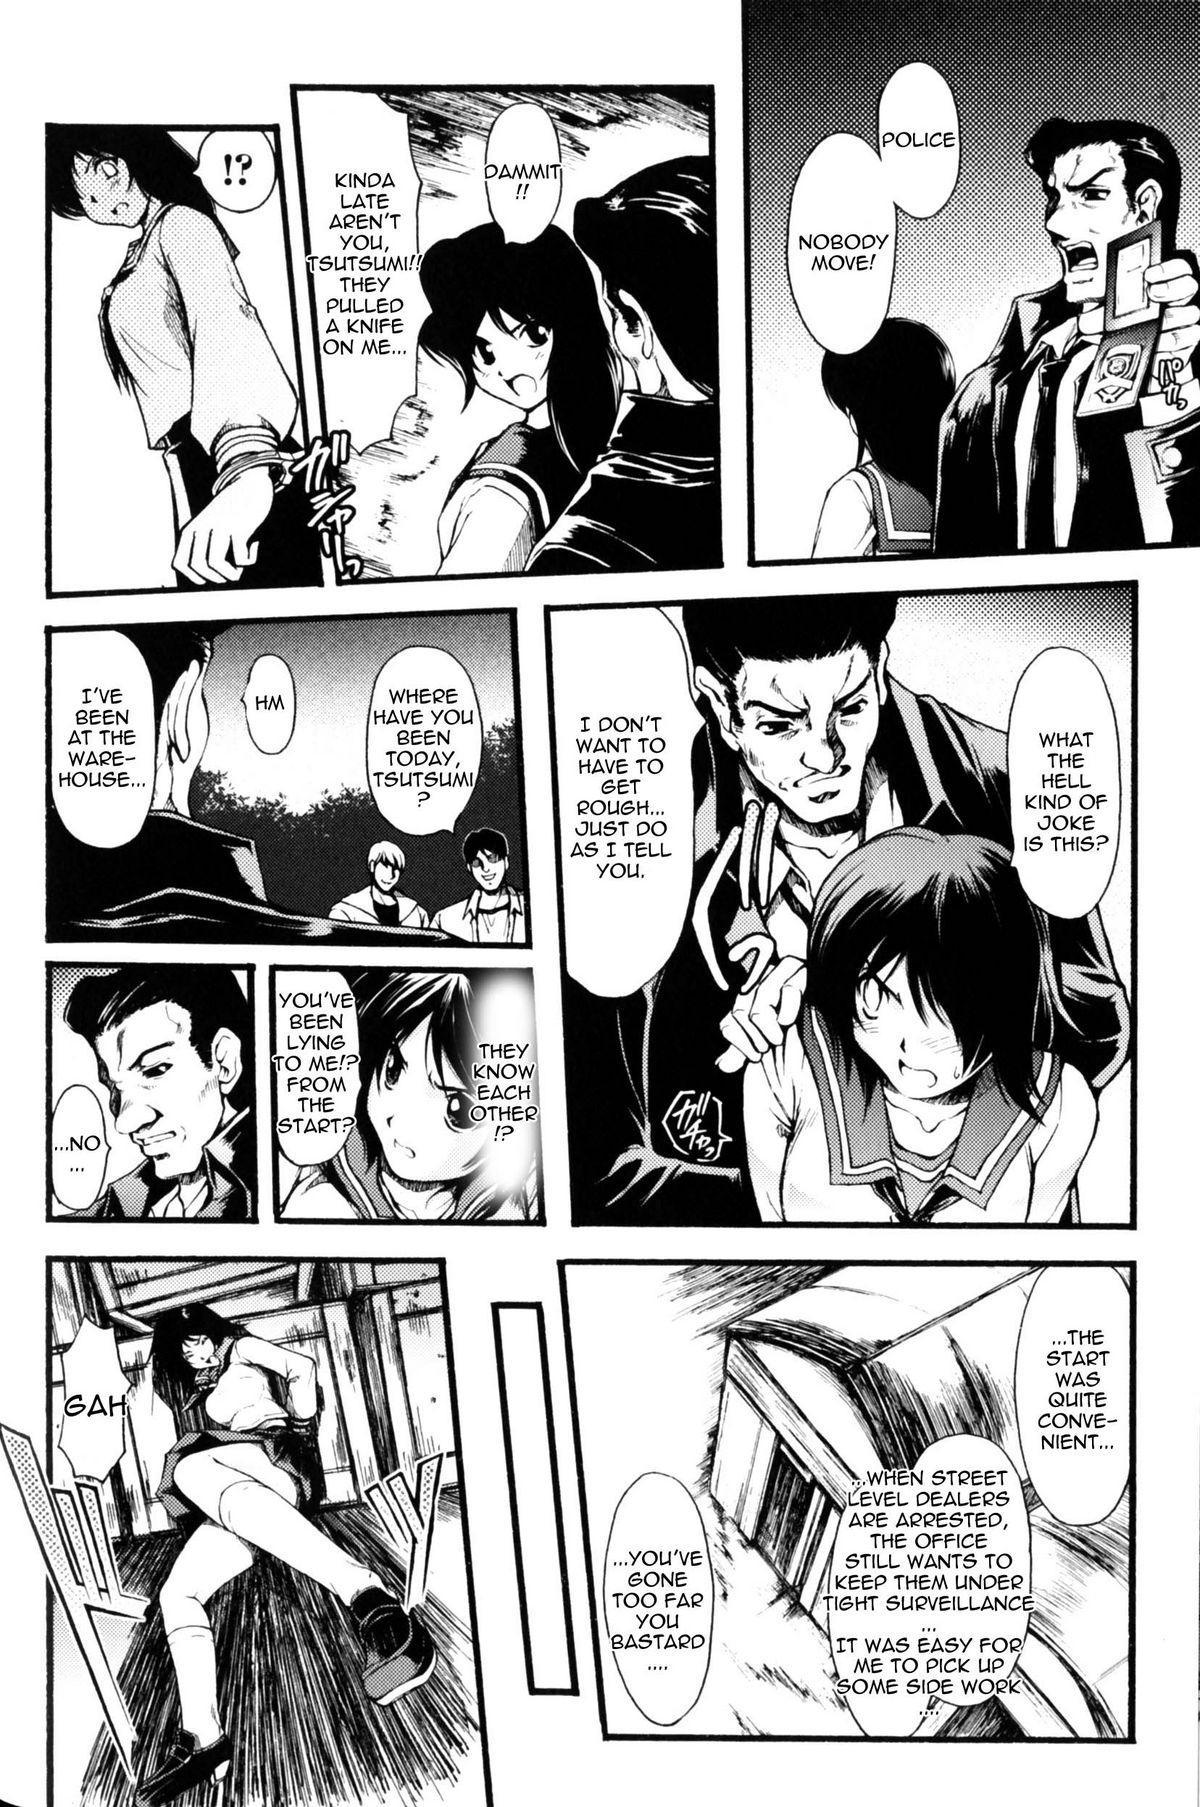 Itzuka-san's Case File 5